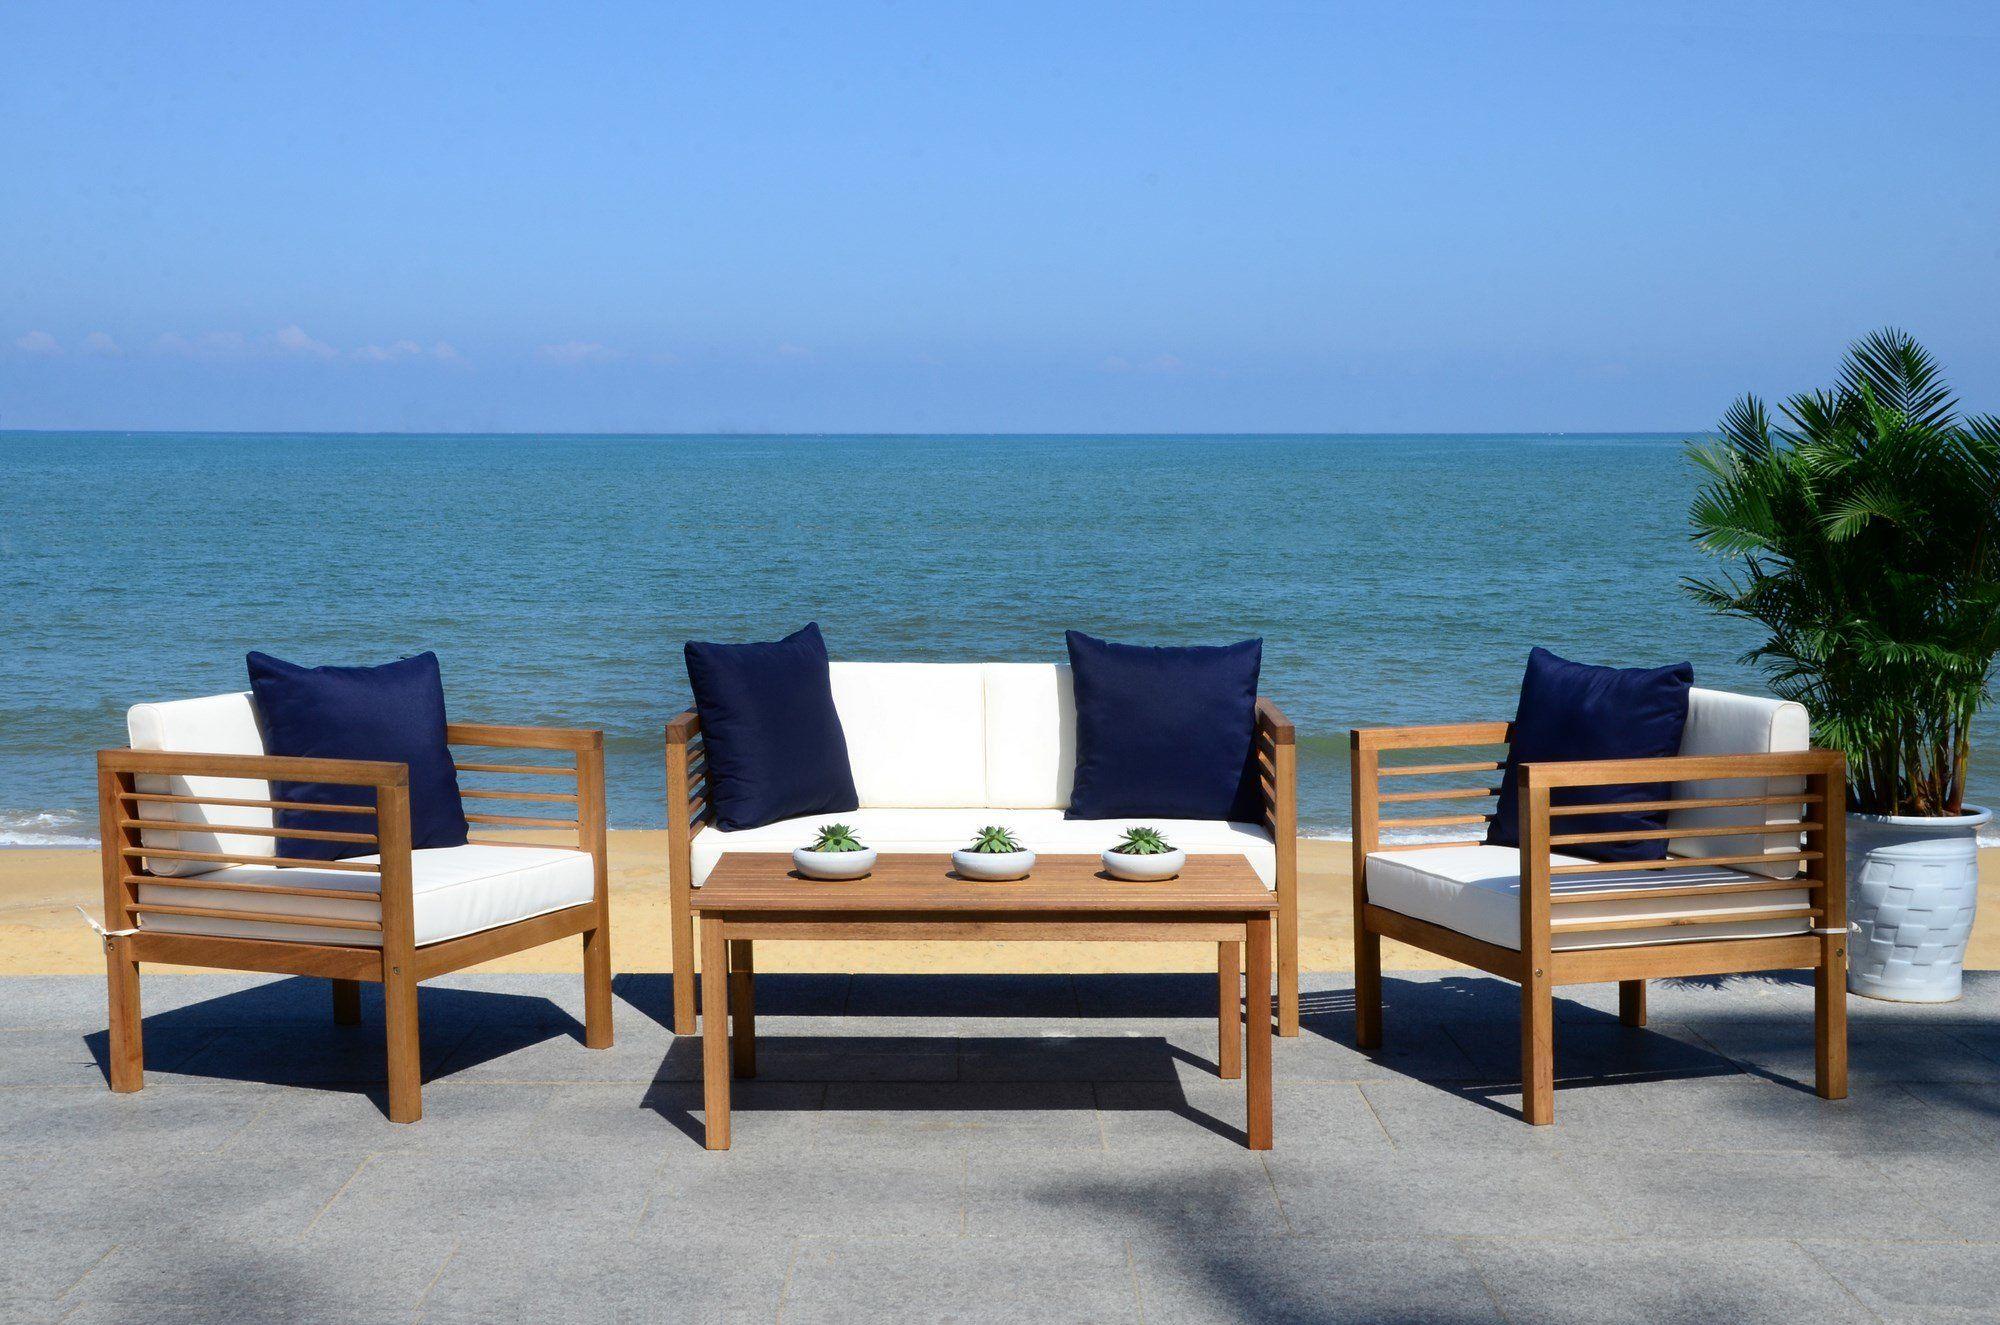 Pierce 4 Piece Lounge Seating Group with Cushion ... on Safavieh Alda 4Pc Outdoor Set id=42173